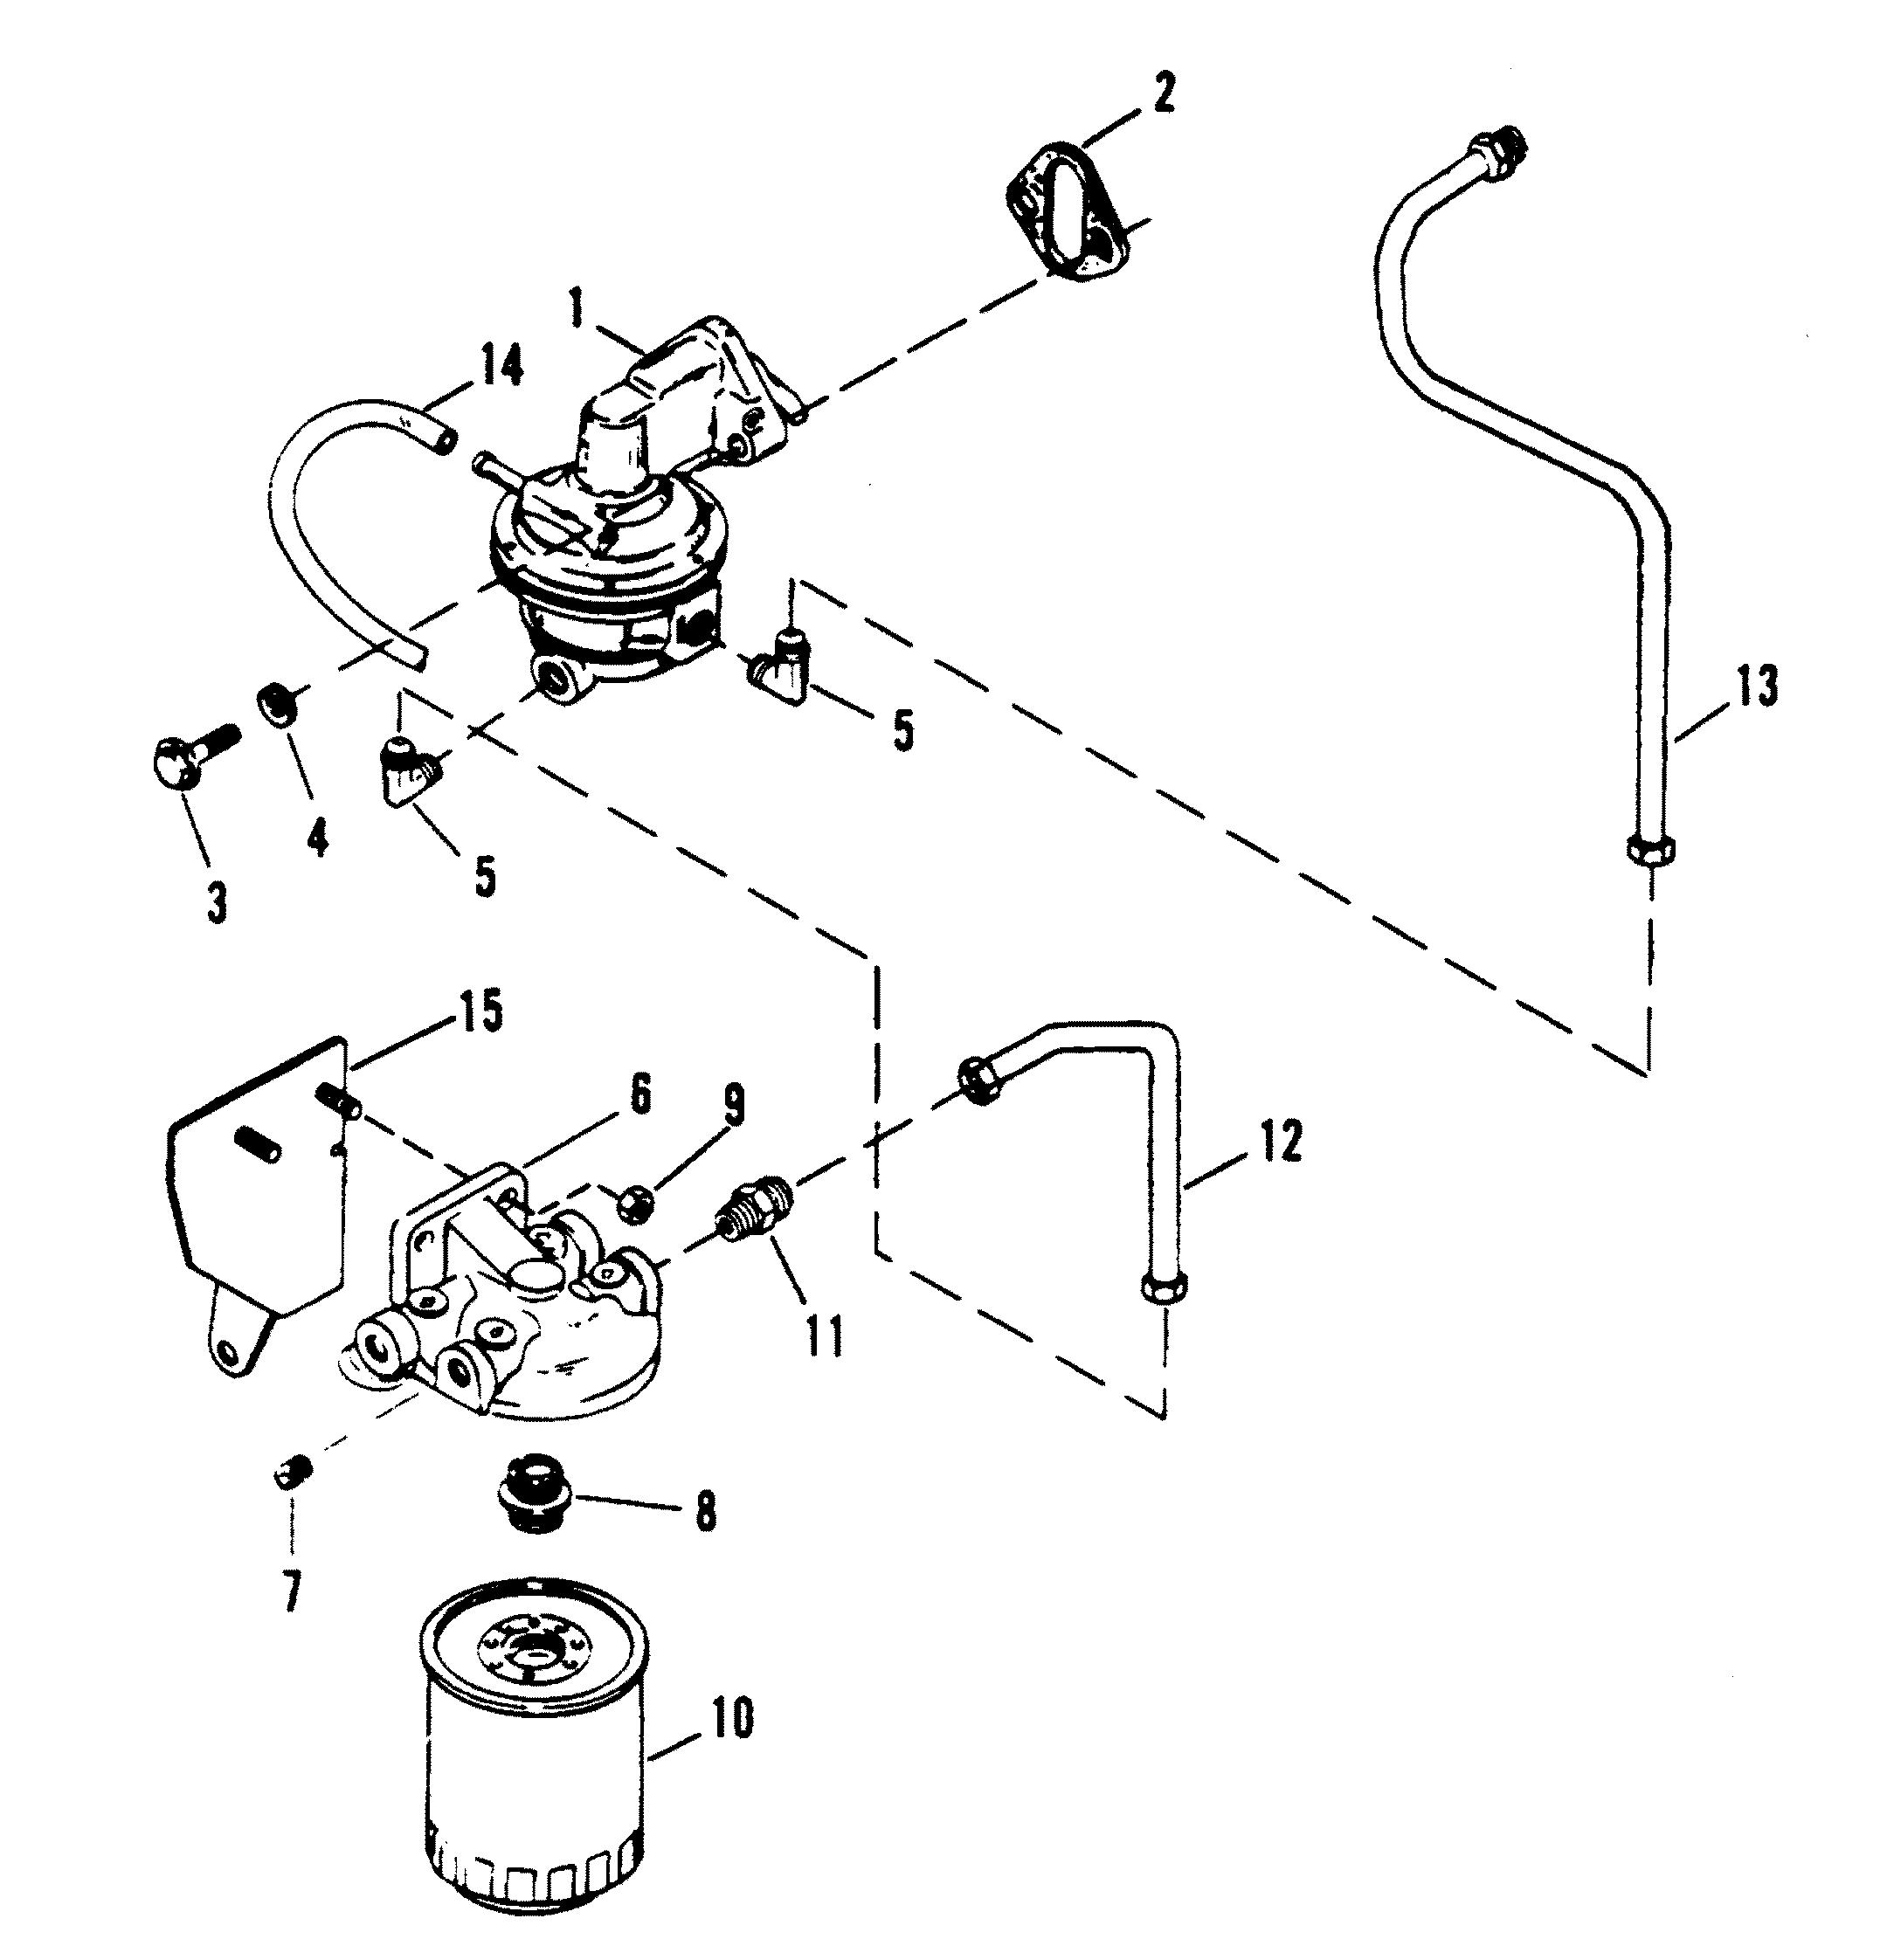 fuel pump and fuel filter for mercruiser 454 mag bravo gen v